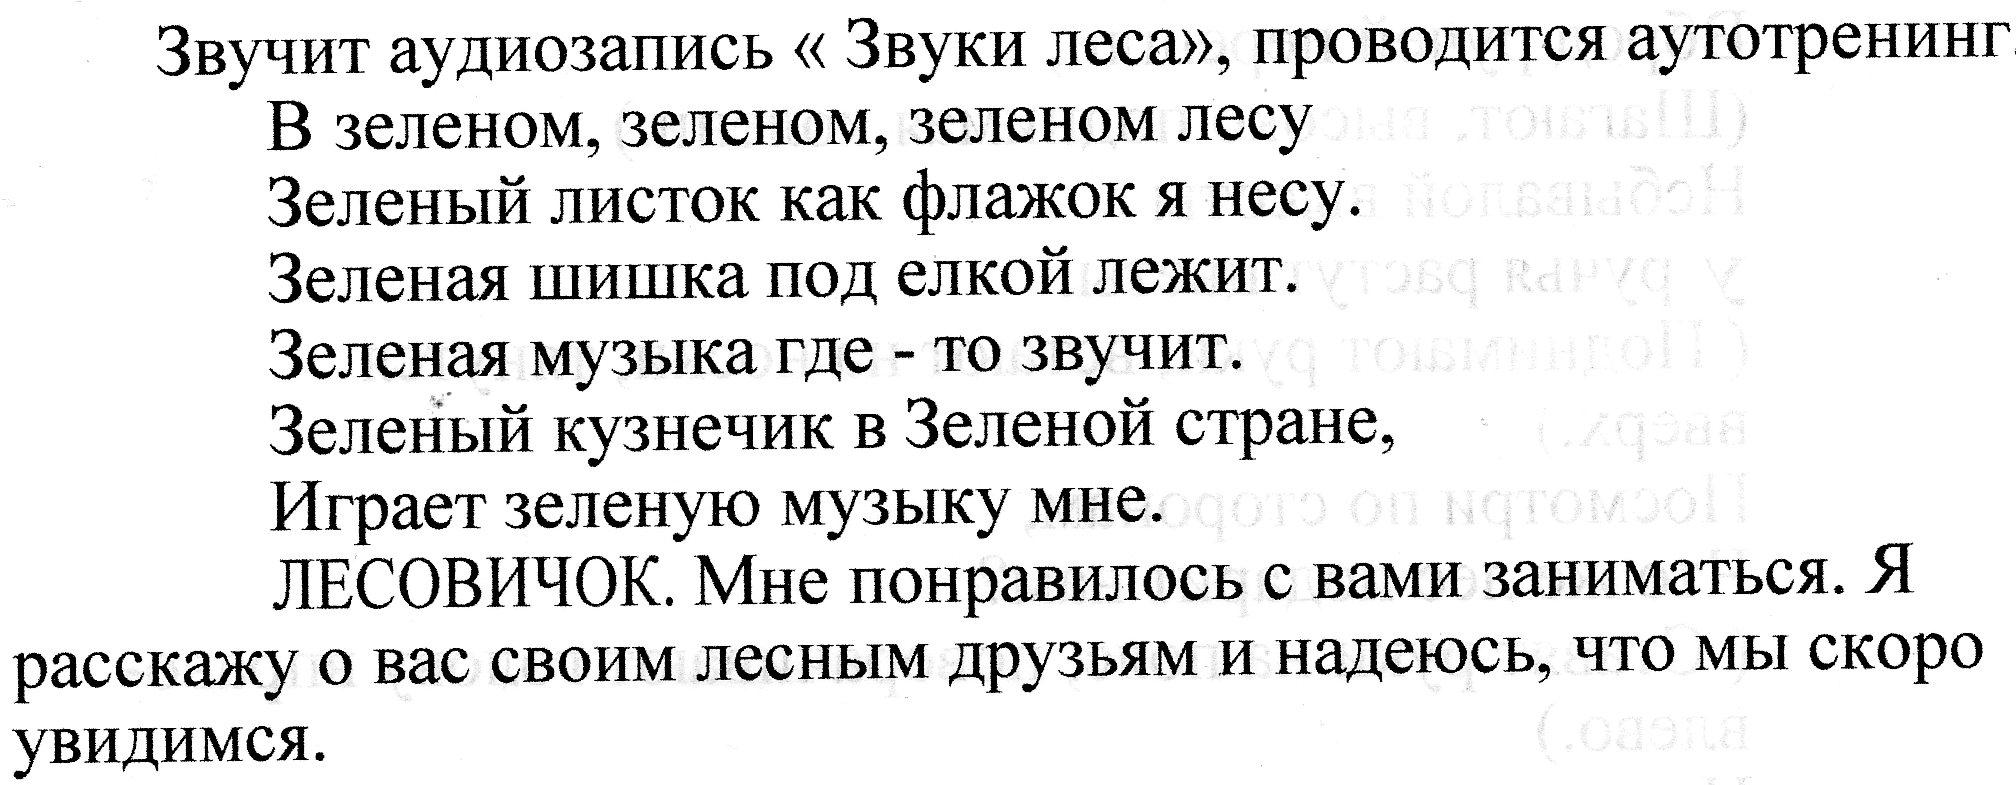 C:\Users\Александр\Pictures\img034.jpg